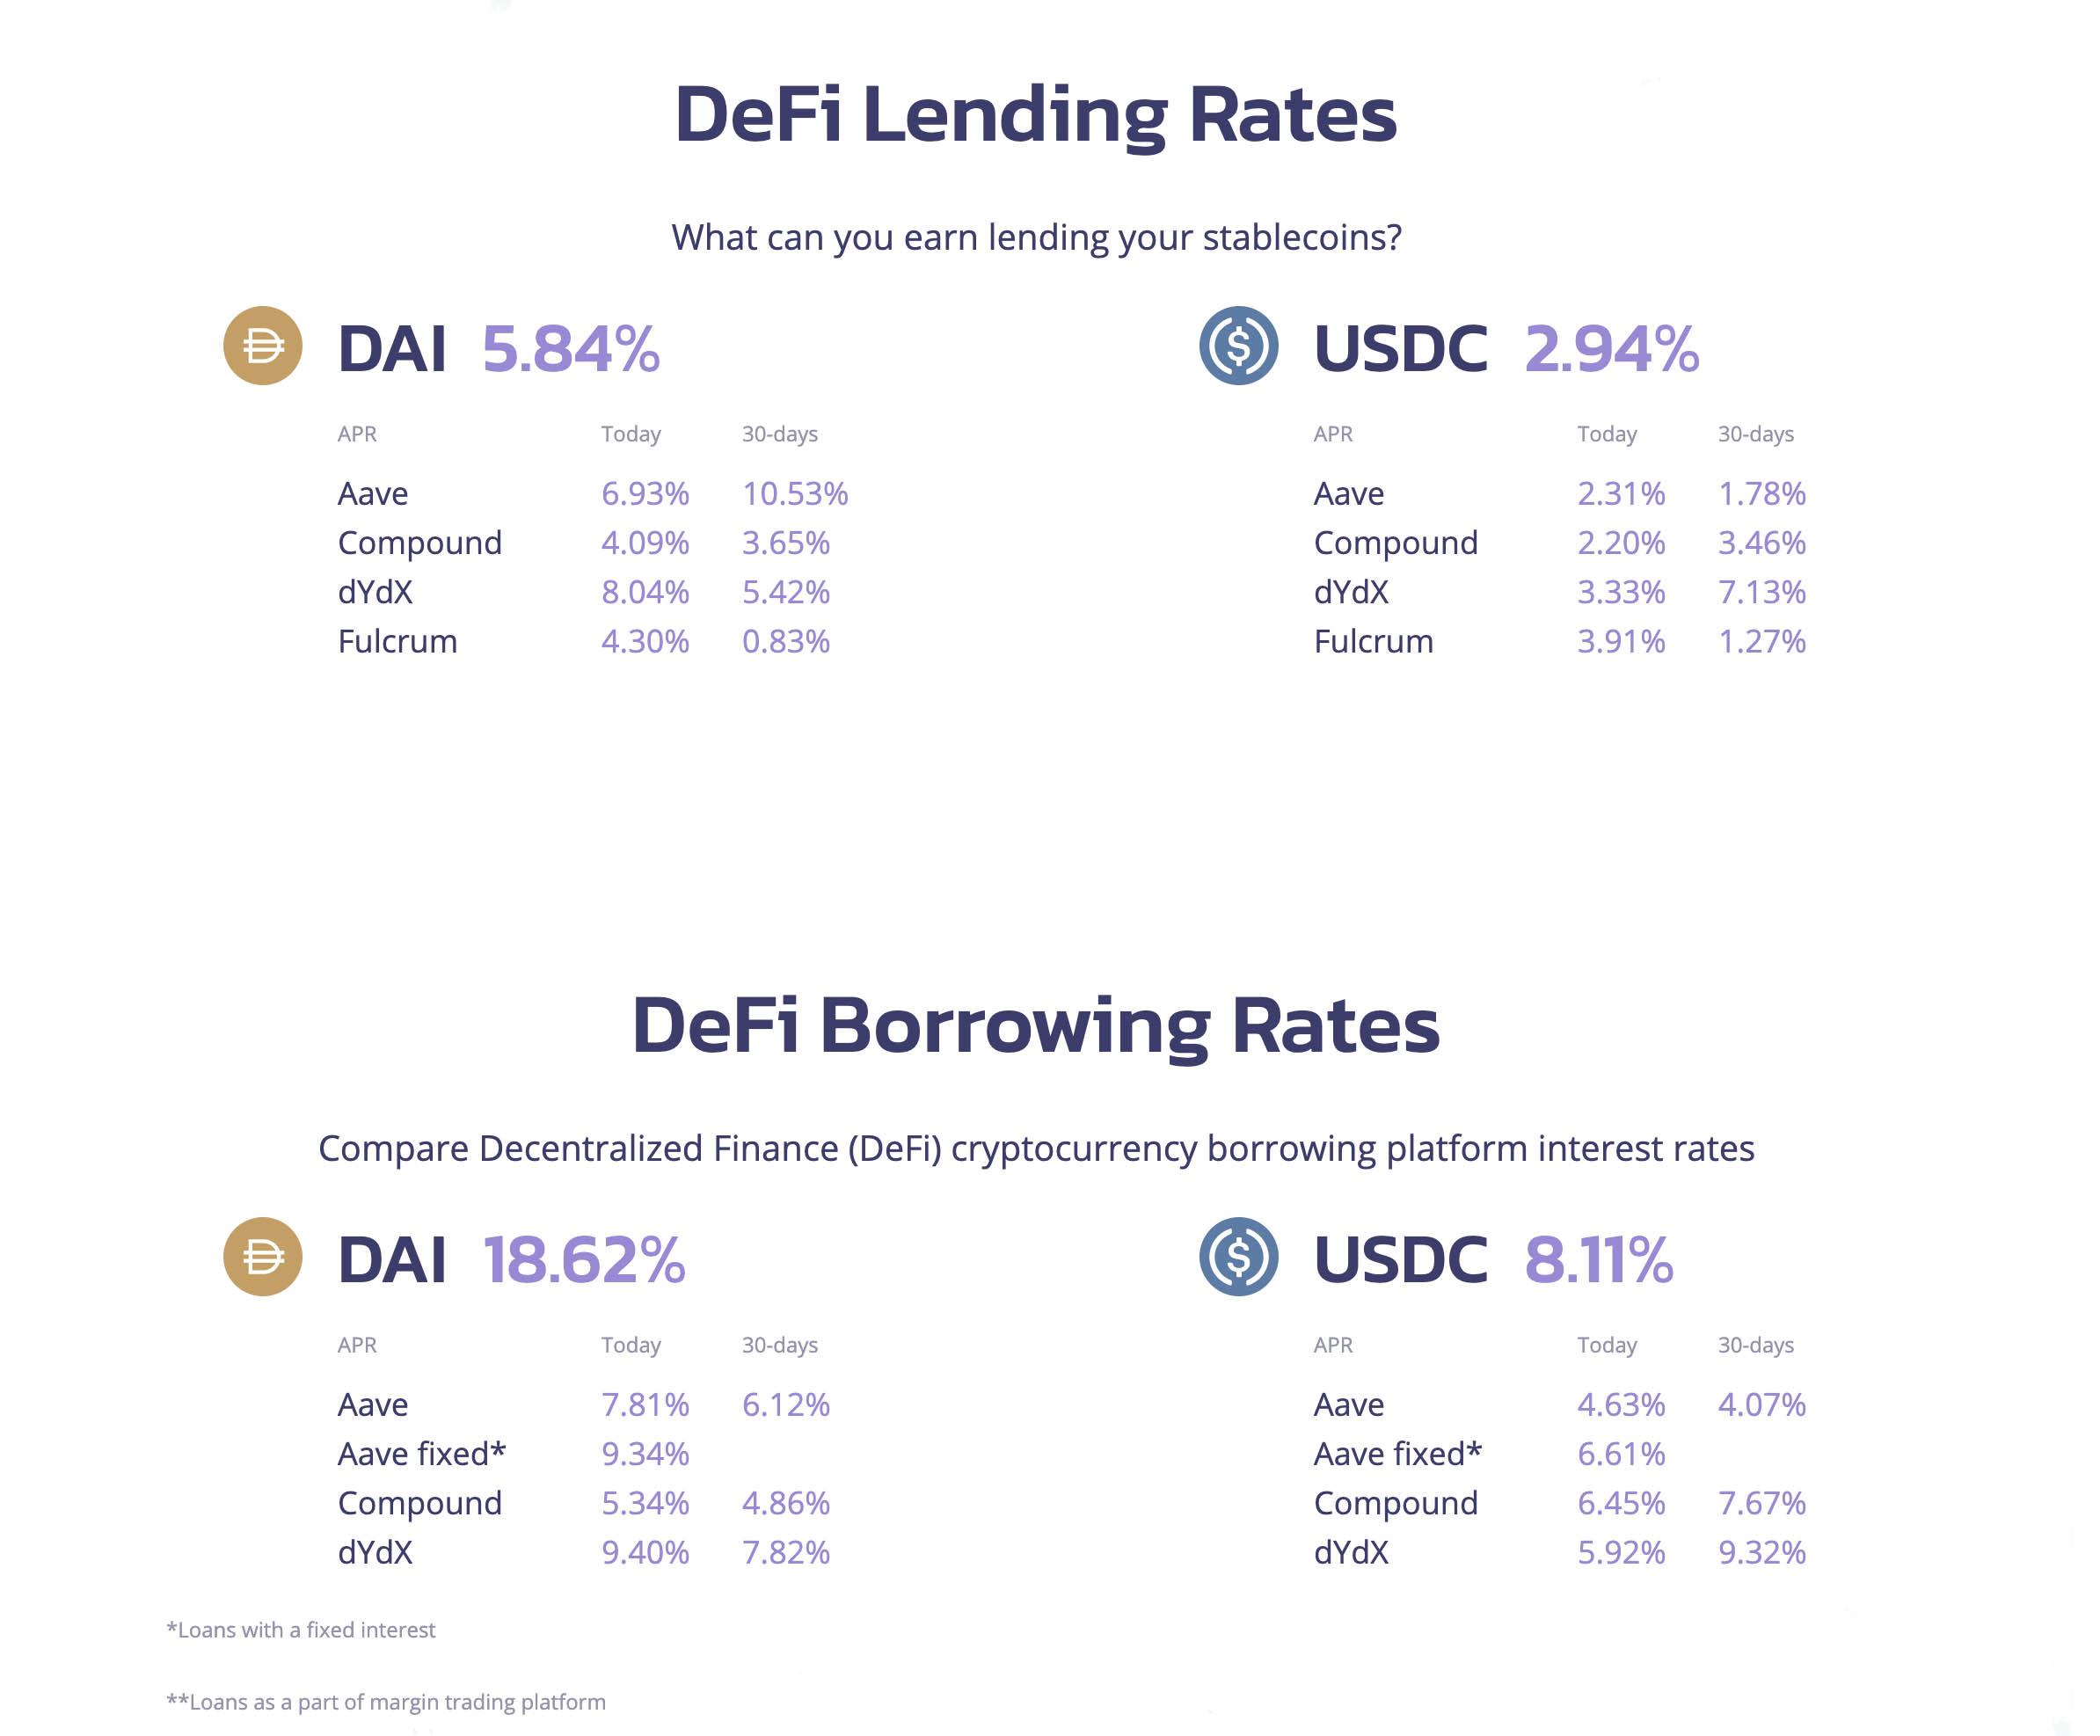 Defi-Lending-Rates-1